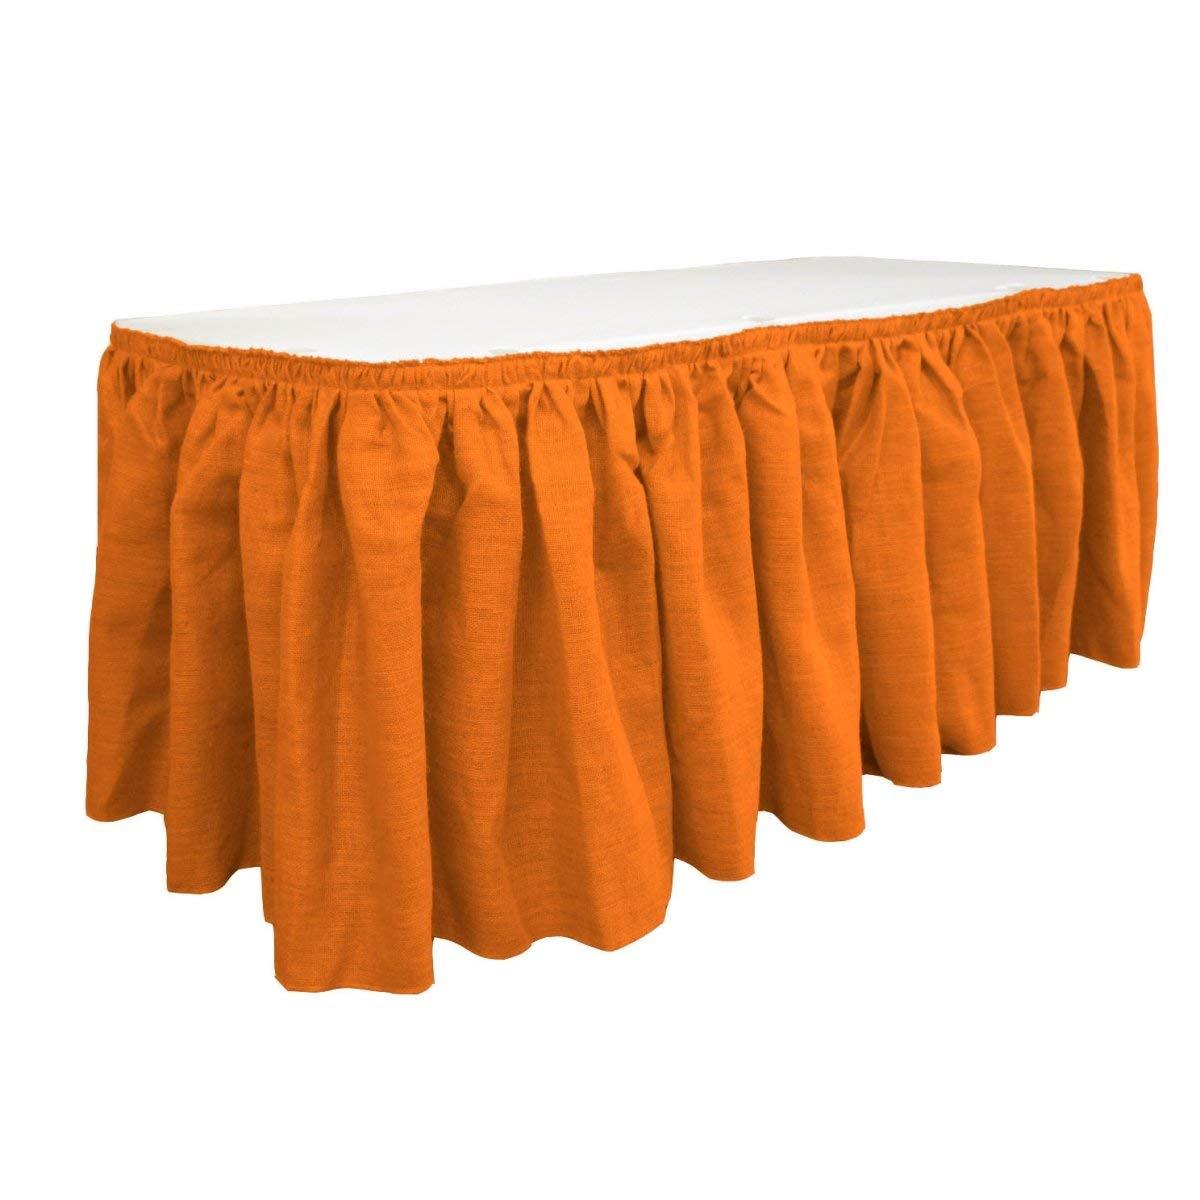 LA Linen SkirtBurlap17x29-10Lclips-Orange Burlap Table Skirt with 10 L-Clips44; Orange - 17 ft. x 29 in.